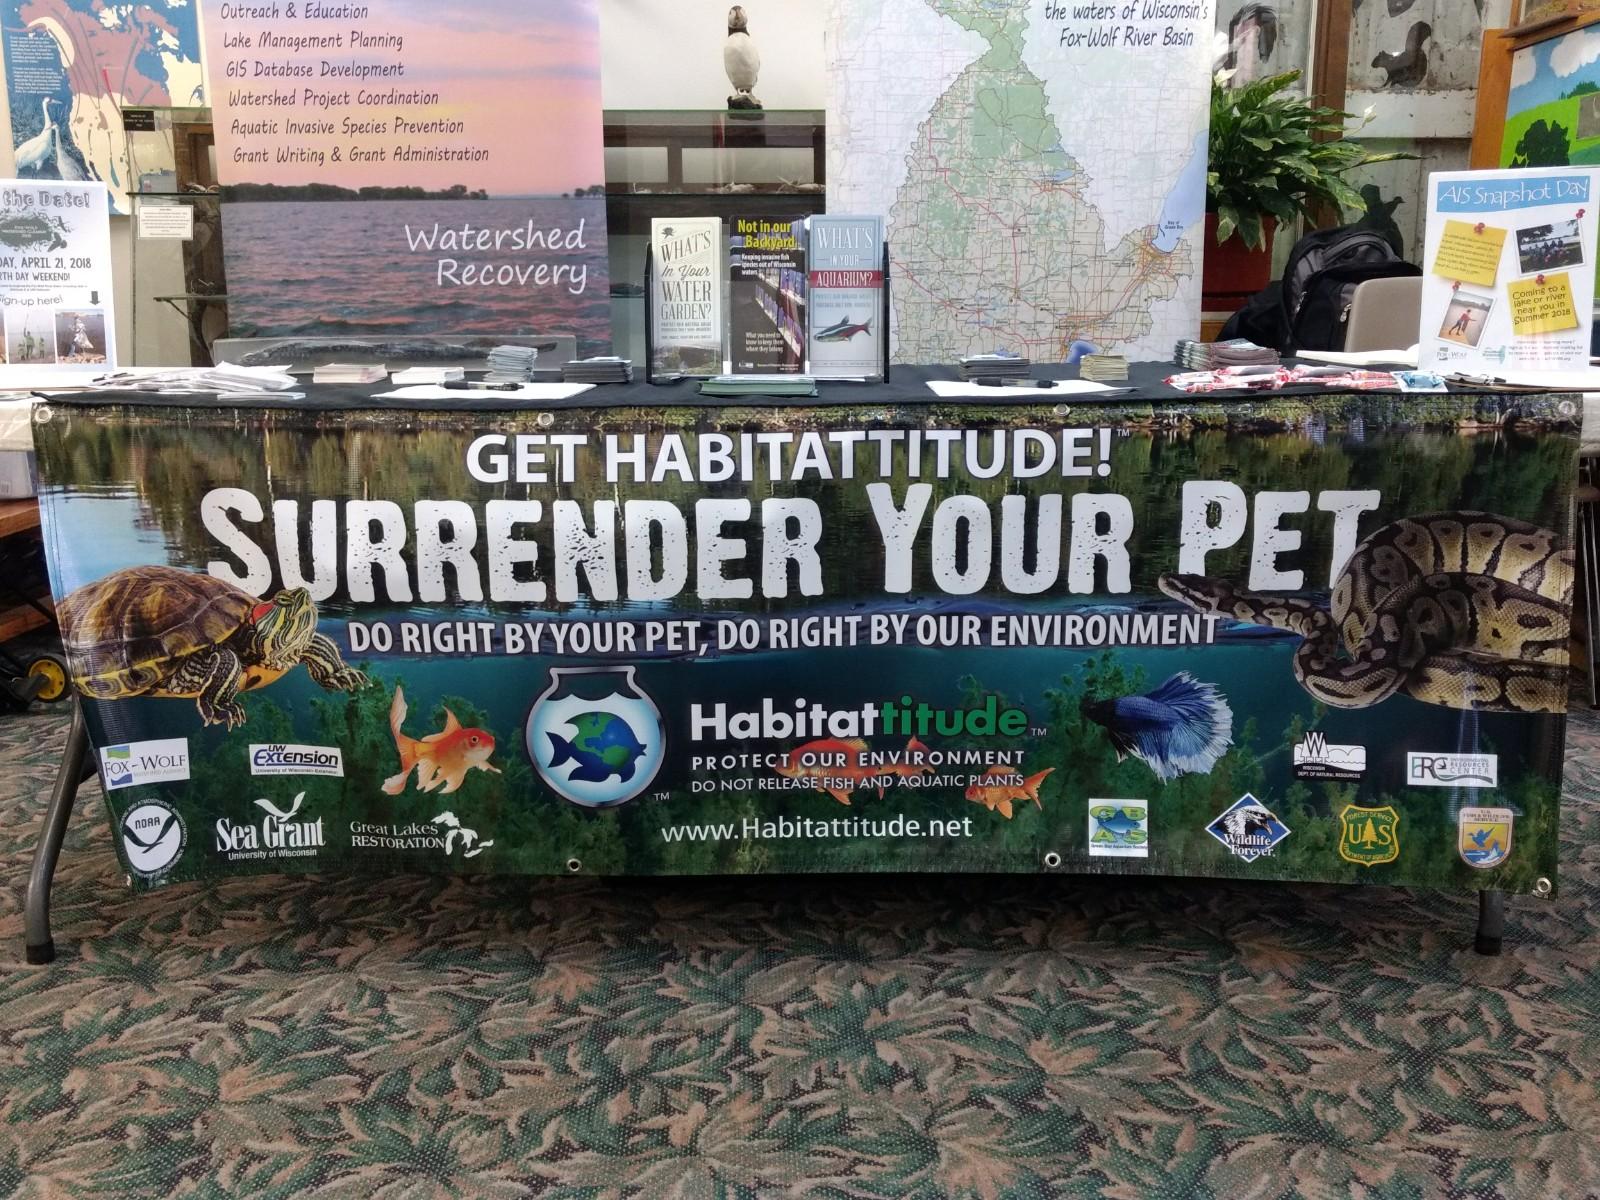 Habitattitude Pet Surrender Event Promotes Responsible Pet Ownership; 28 Pets Surrendered!